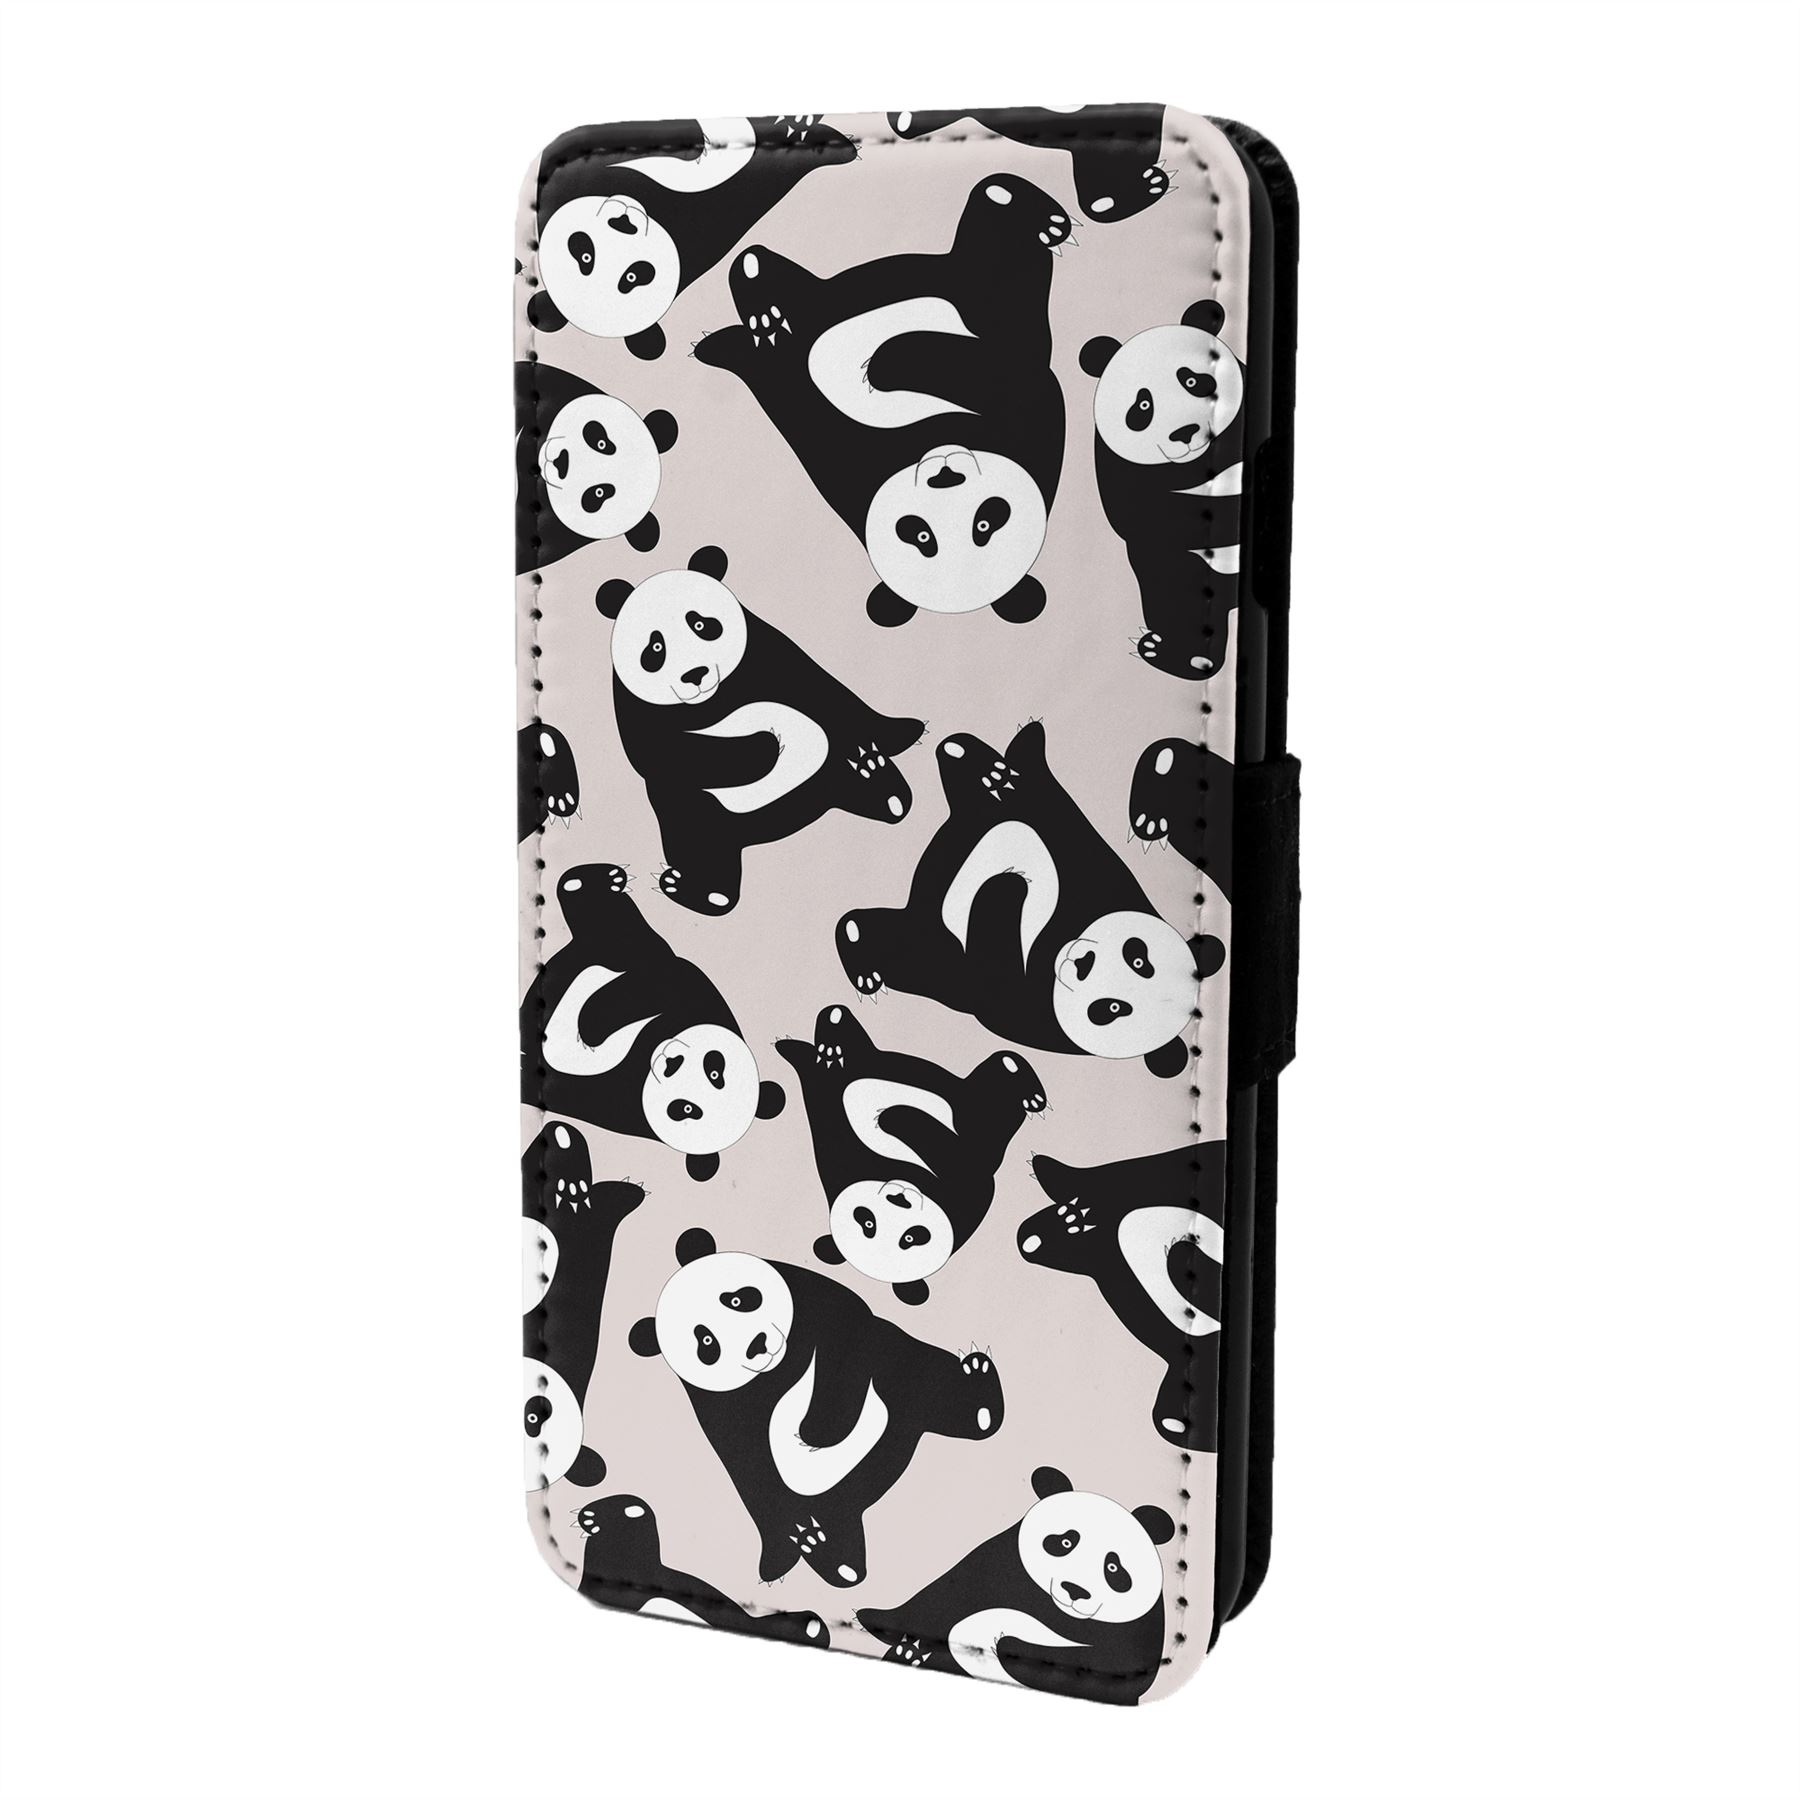 Oso-Panda-Estampado-Funda-Libro-para-Telefono-Movil-S6998